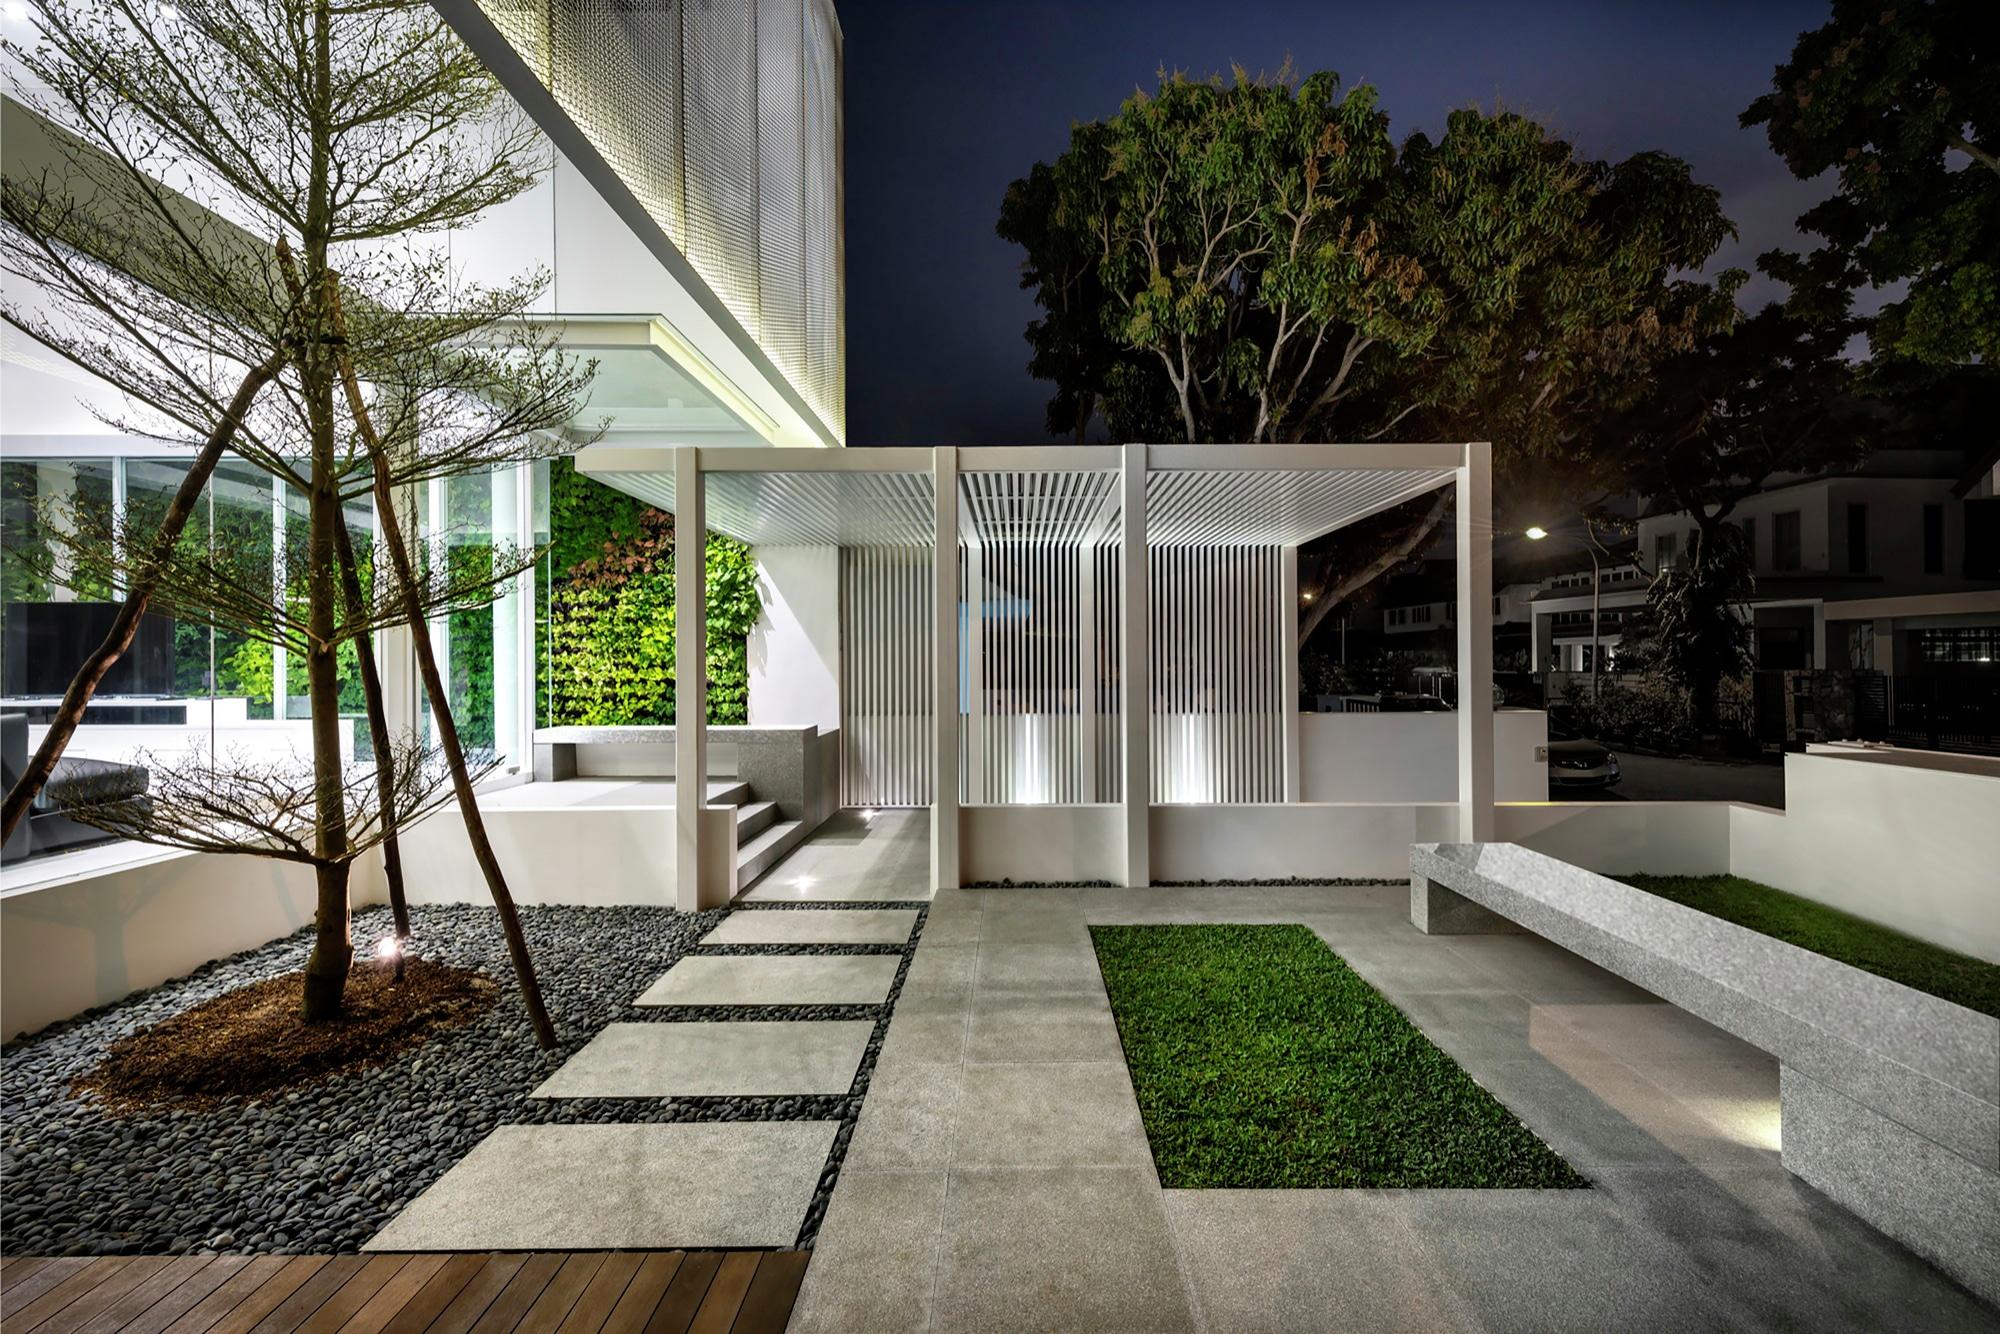 Casa moderna cuatro dormitorios construye hogar for Fotos de jardines de casas modernas